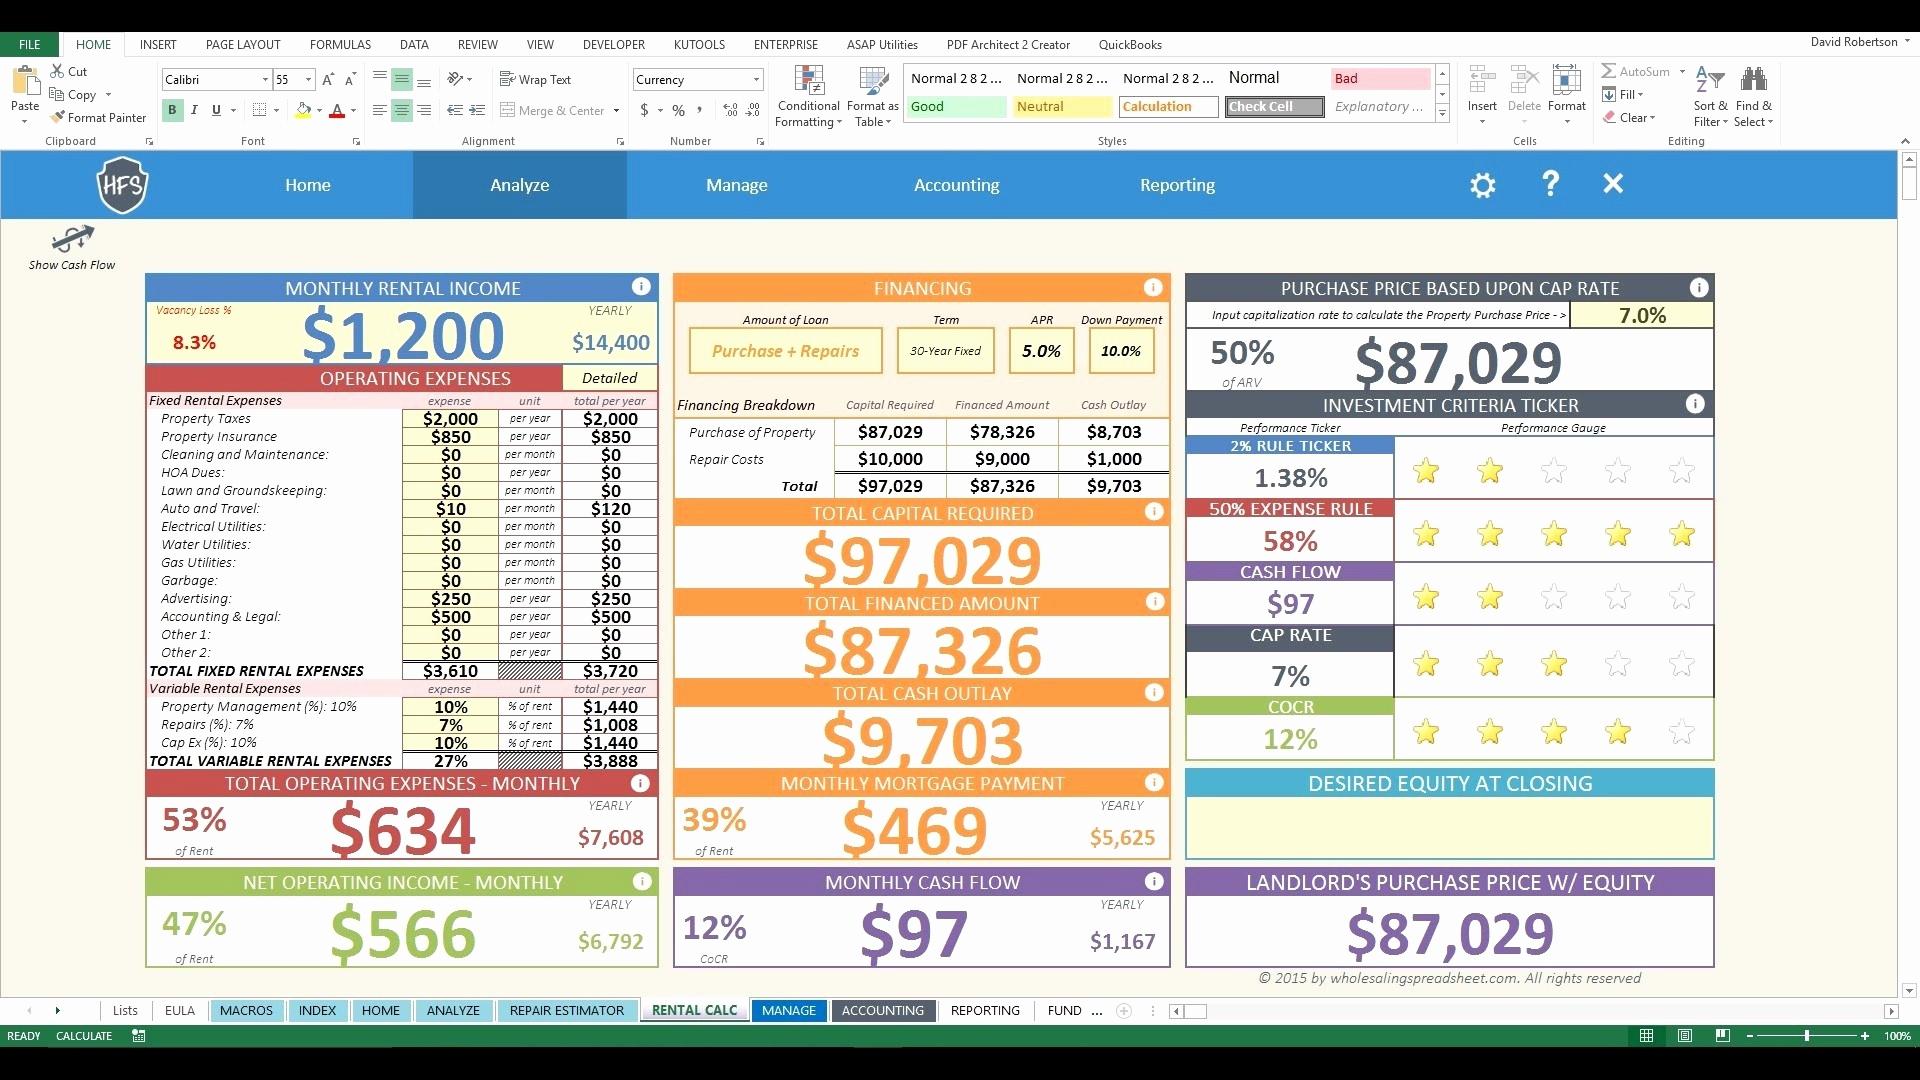 Real Estate Investment Analysis Spreadsheet Beautiful Multifamily To Real Estate Spreadsheet Analysis